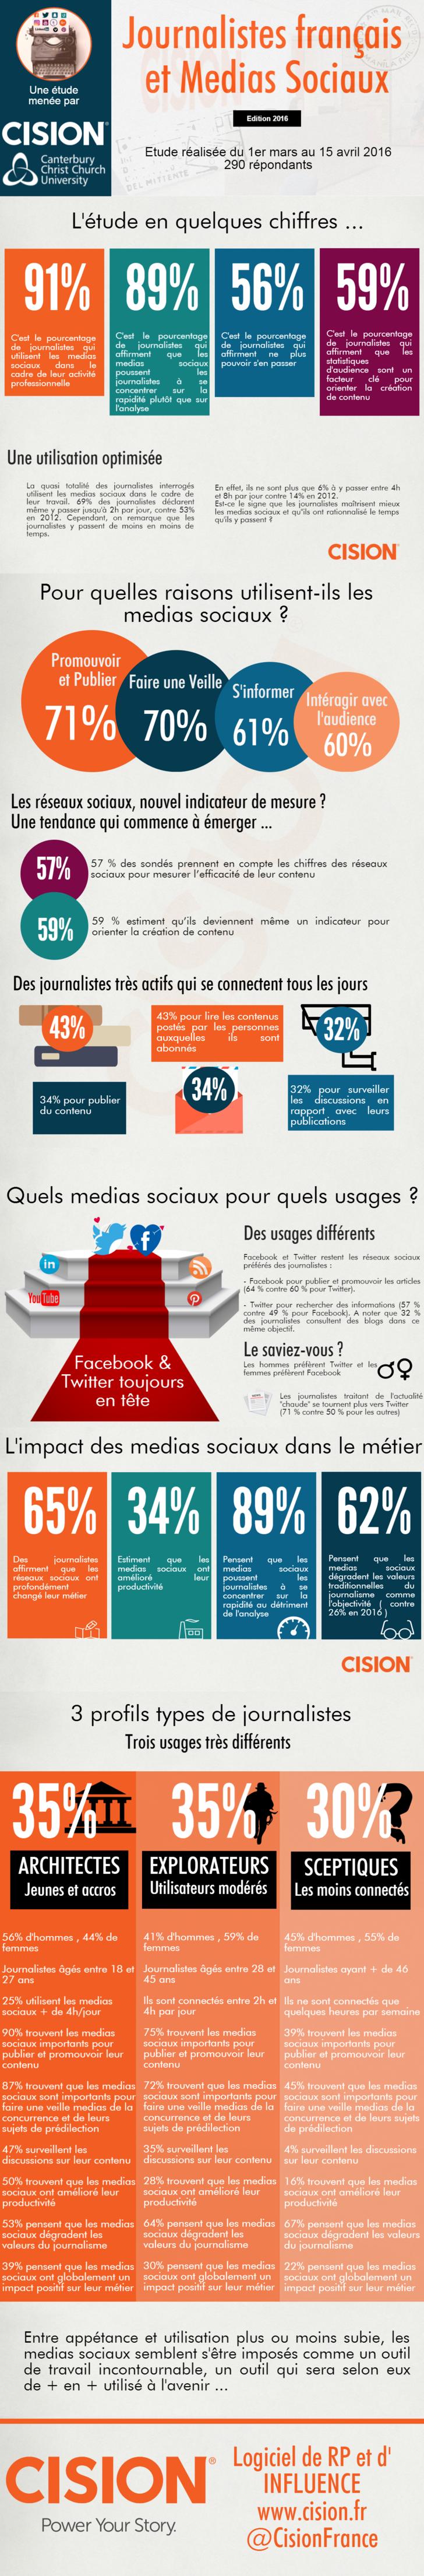 medias-sociaux-journalistes-2